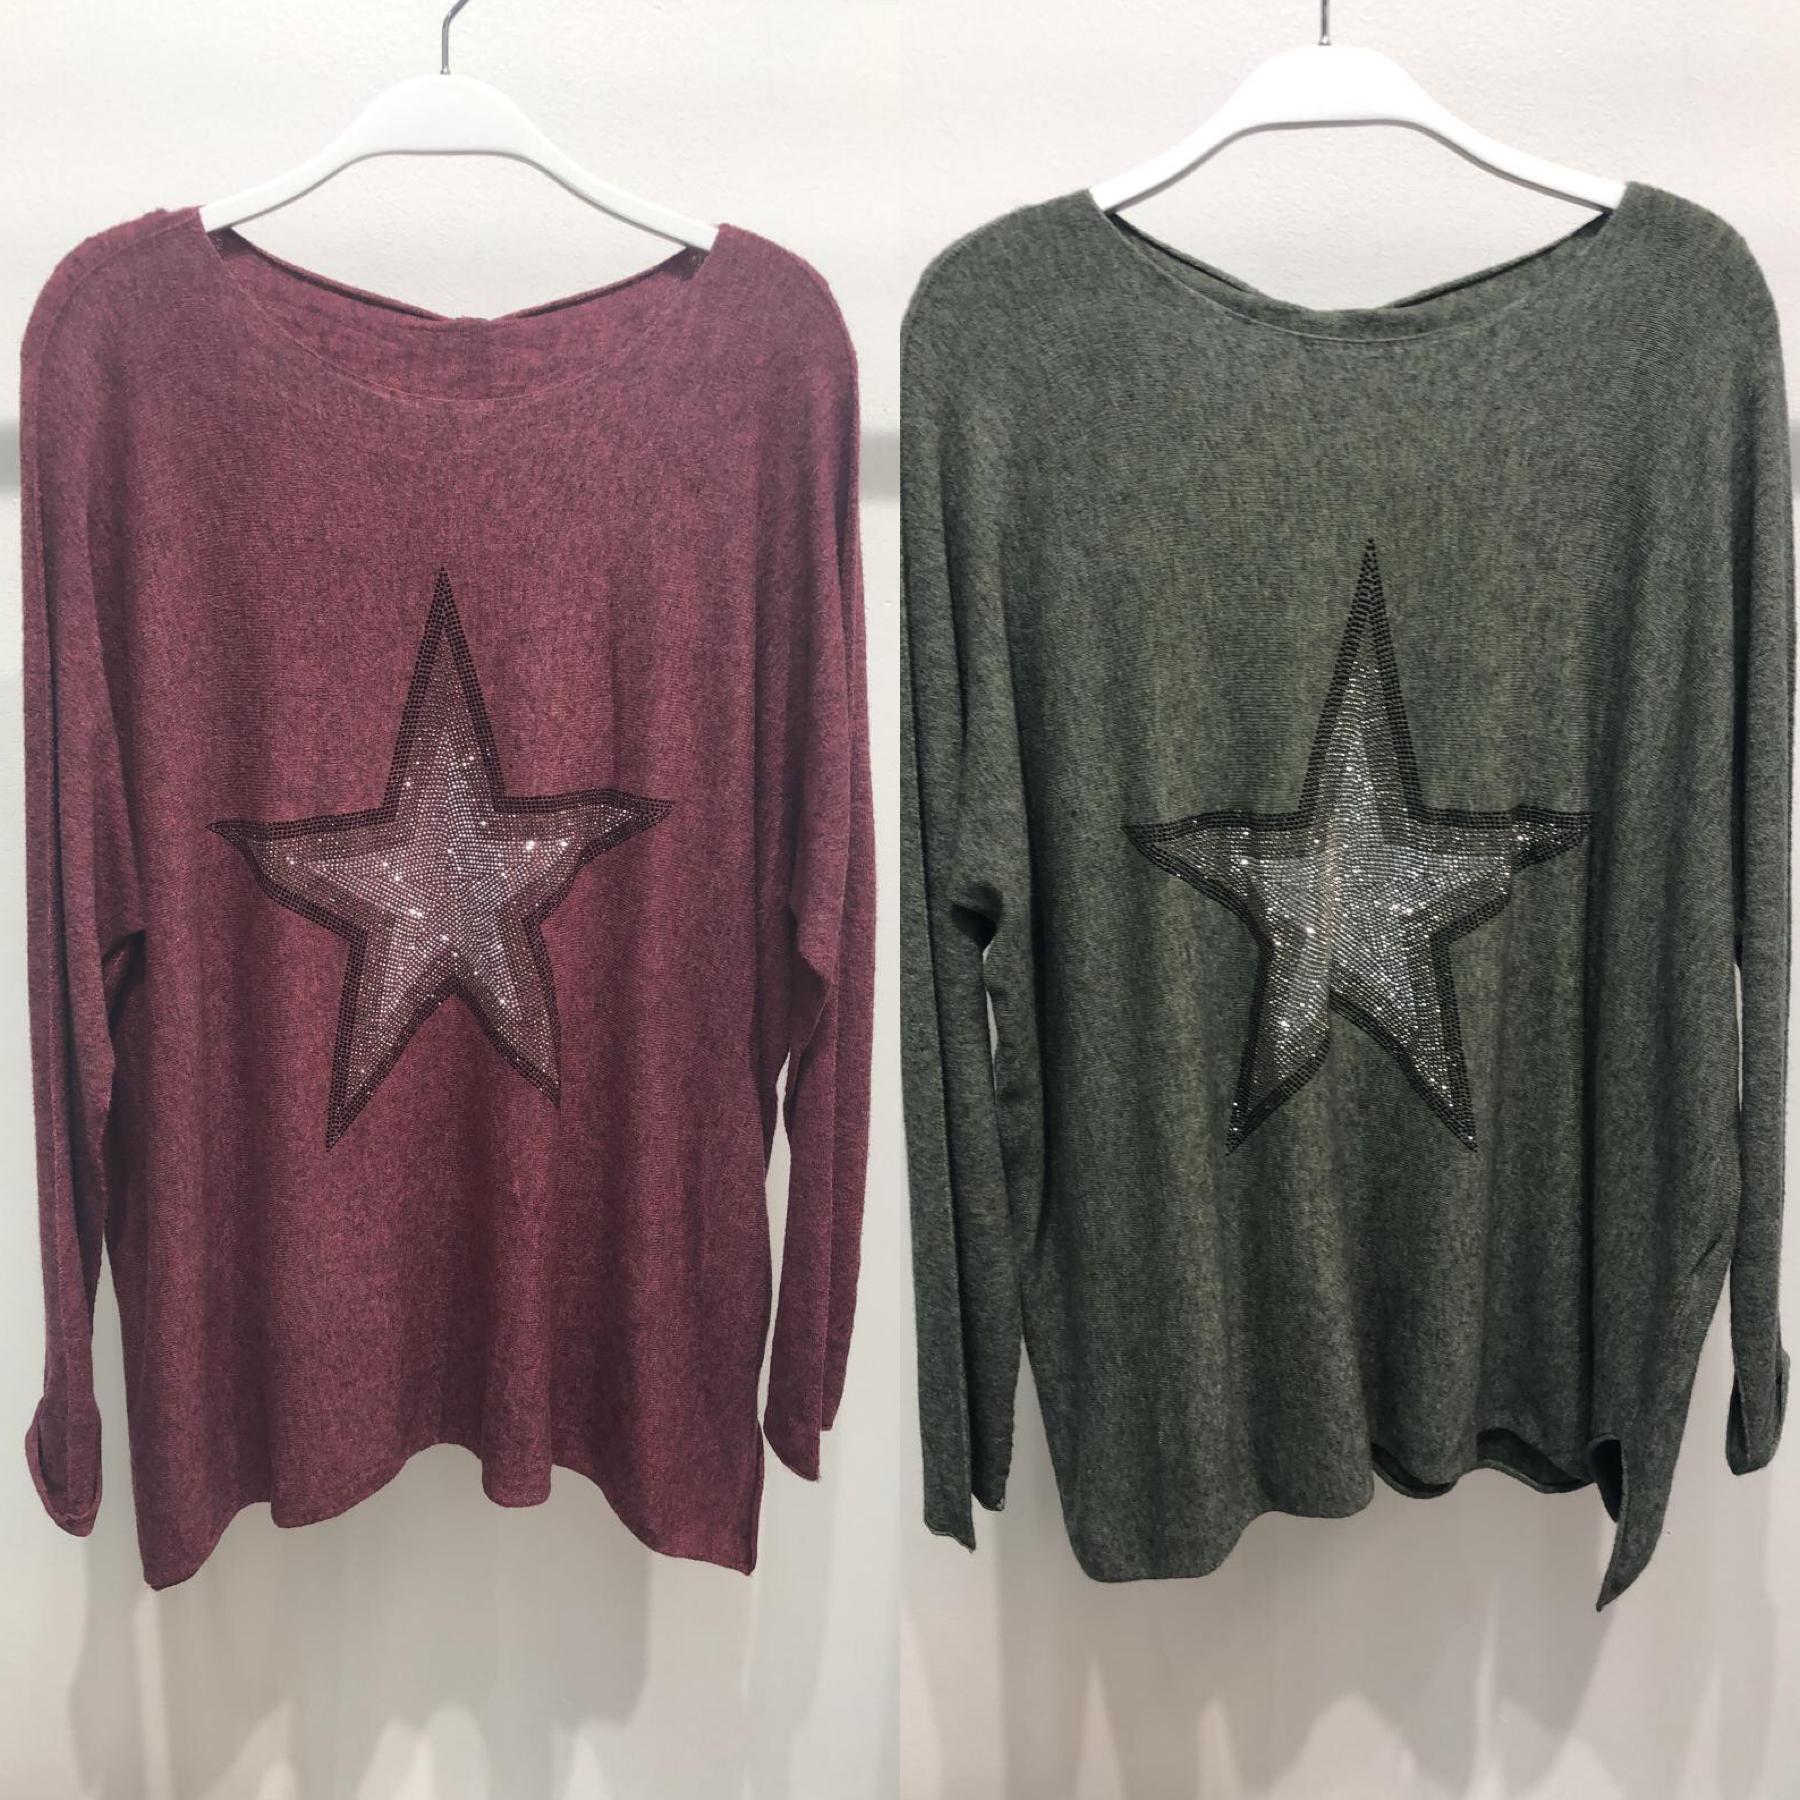 Rhinestone Star Knit Sweater